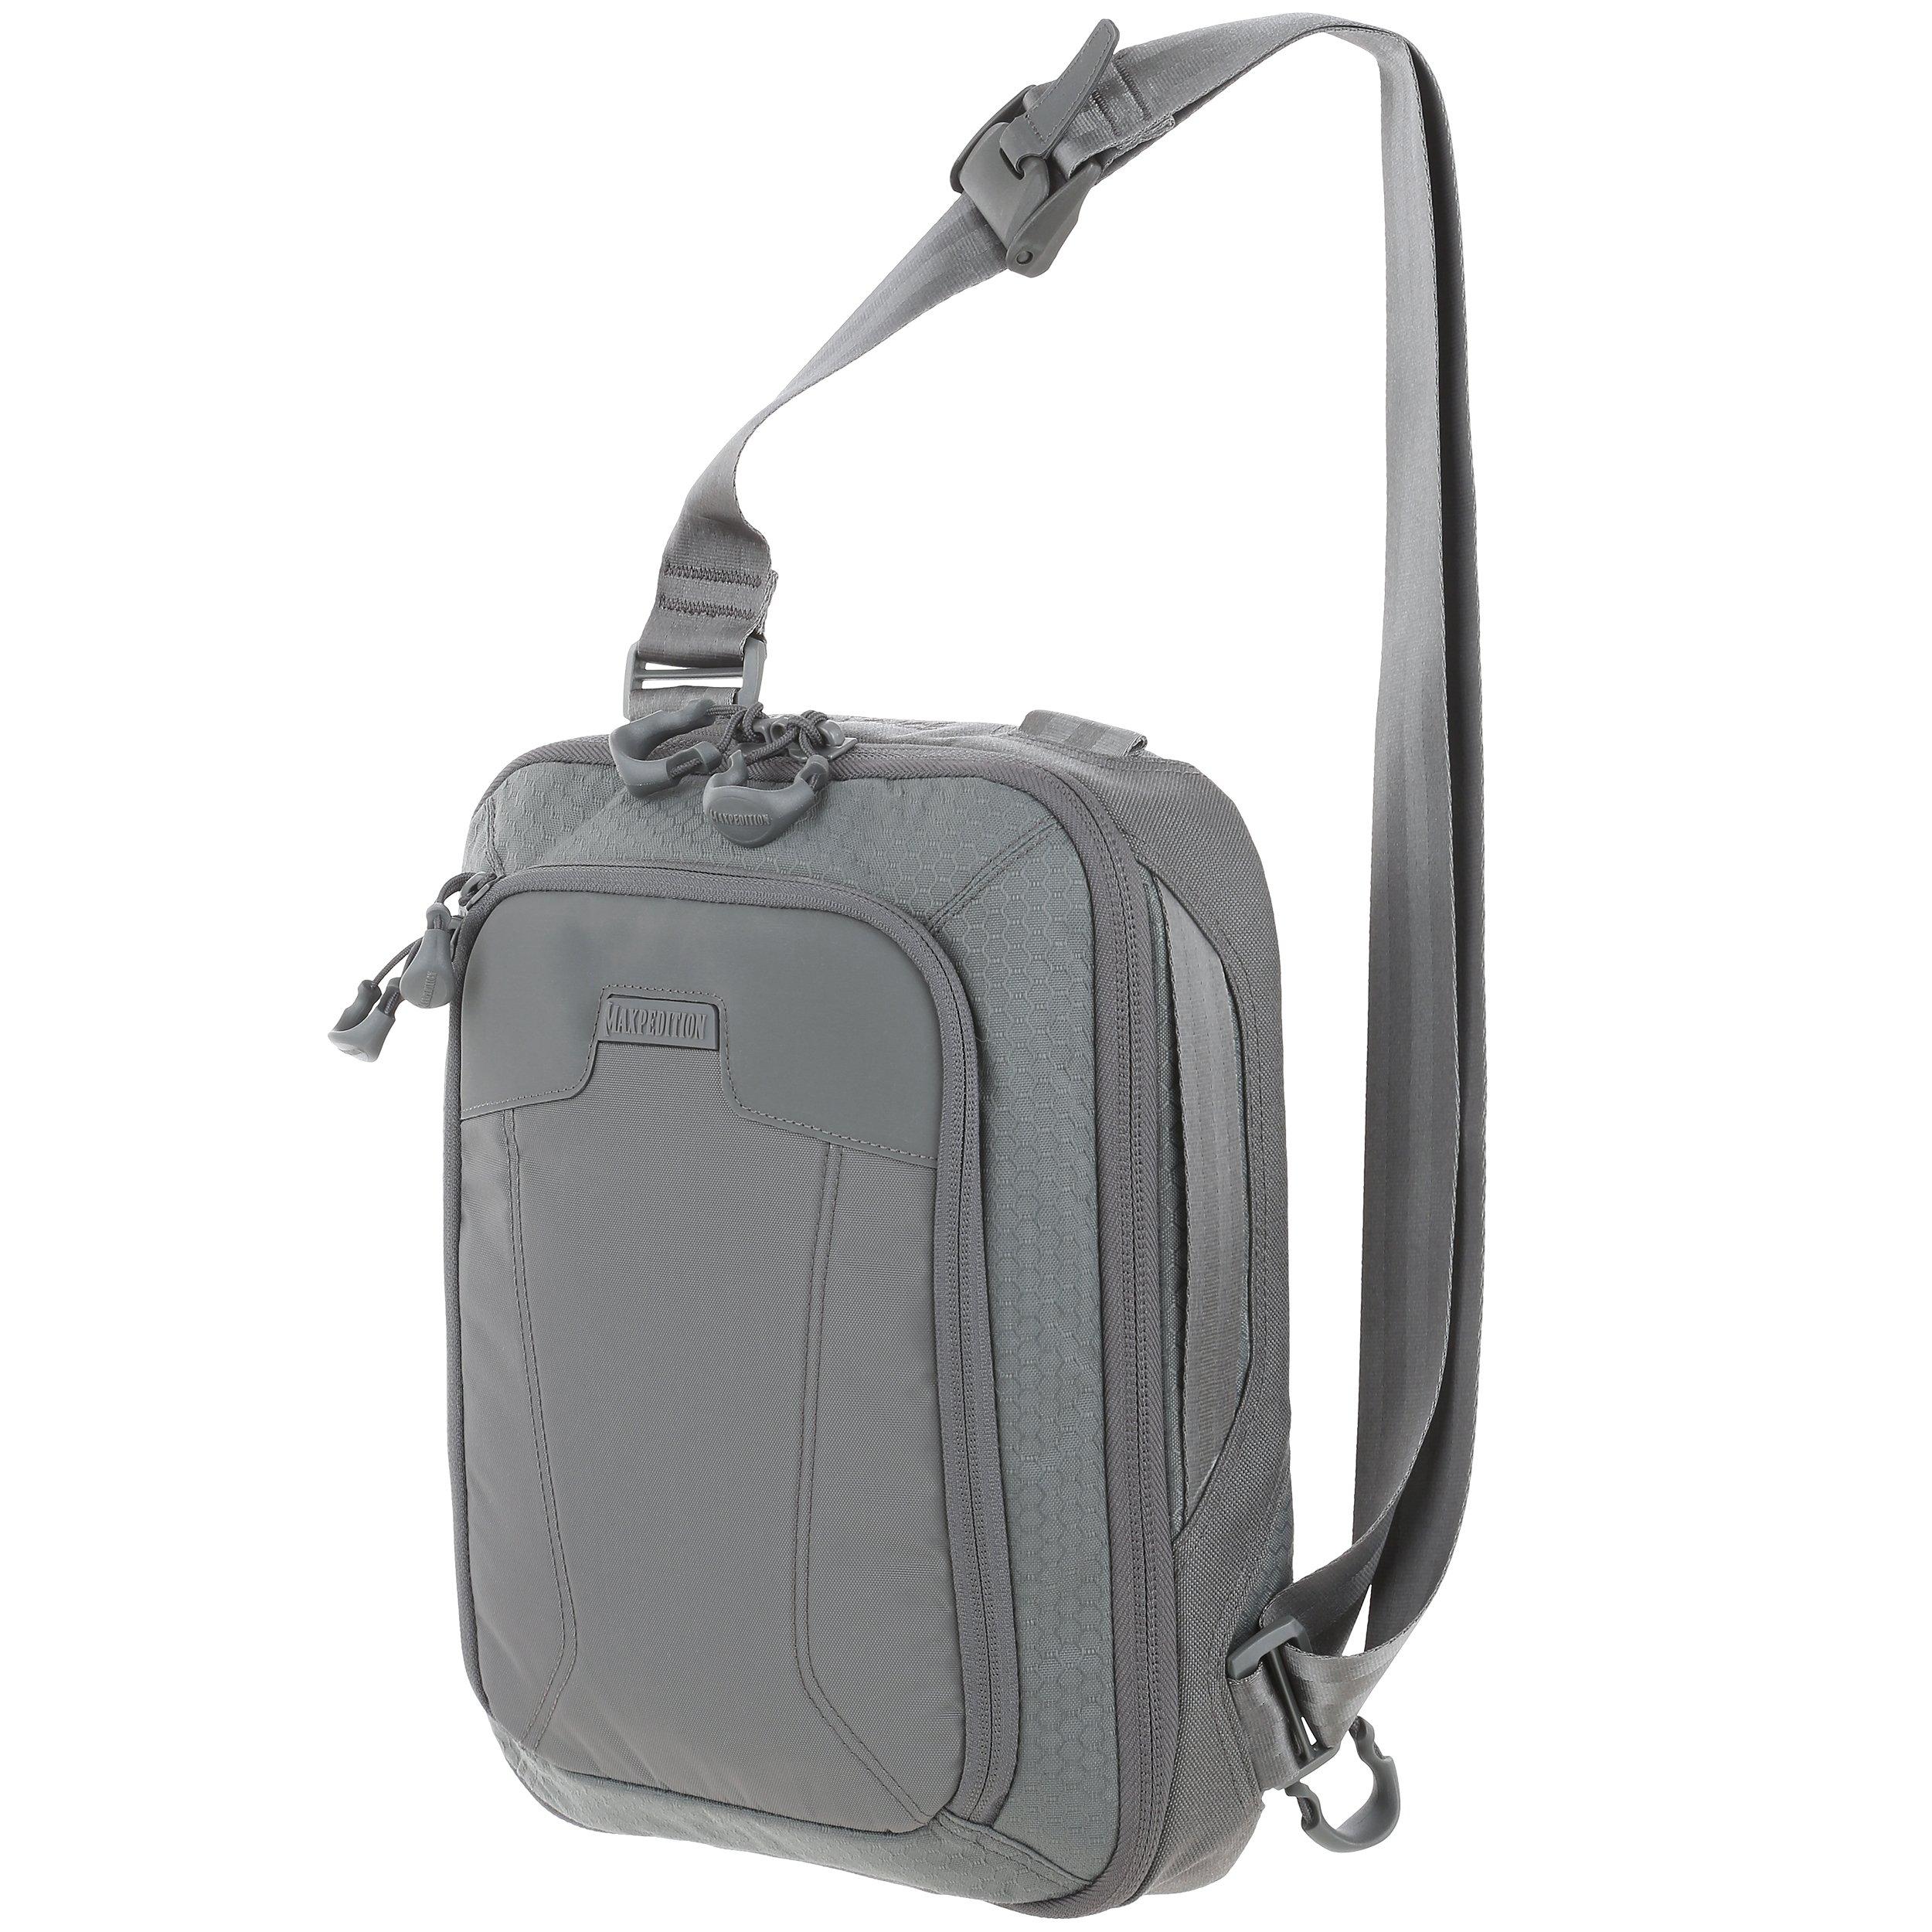 Maxpedition Mini Valence Tech Sling Pack 7L Gray